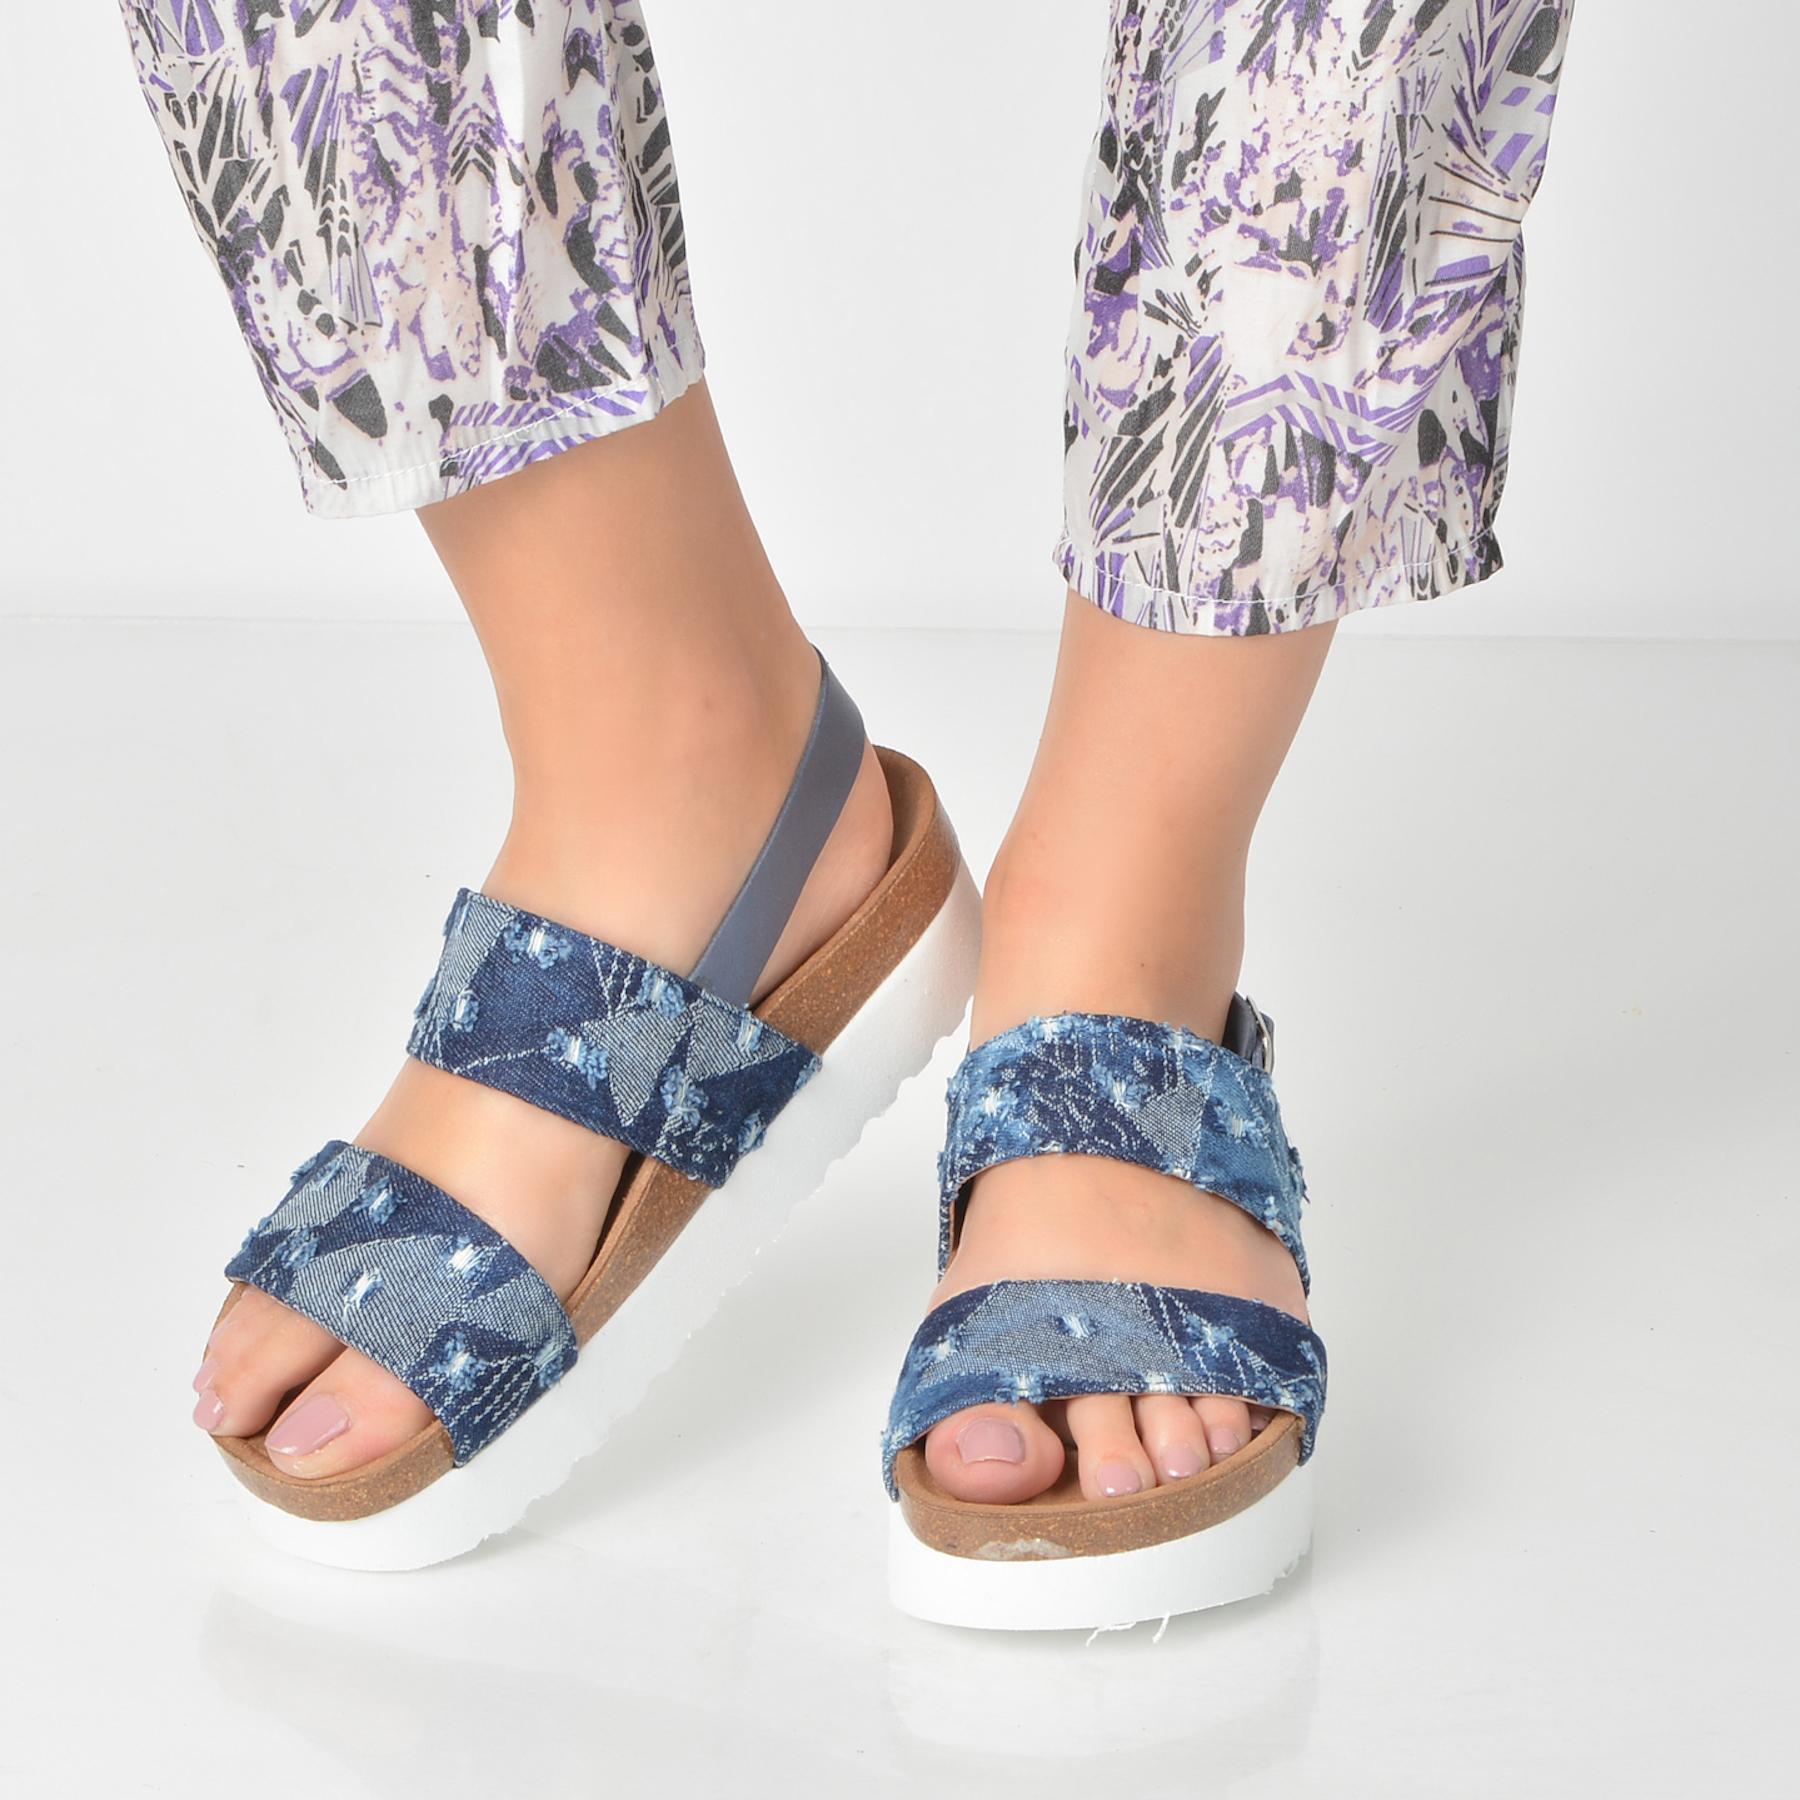 Sandale LA COMPANIA NATURAL albastre, 17516, din piele naturala si material textil